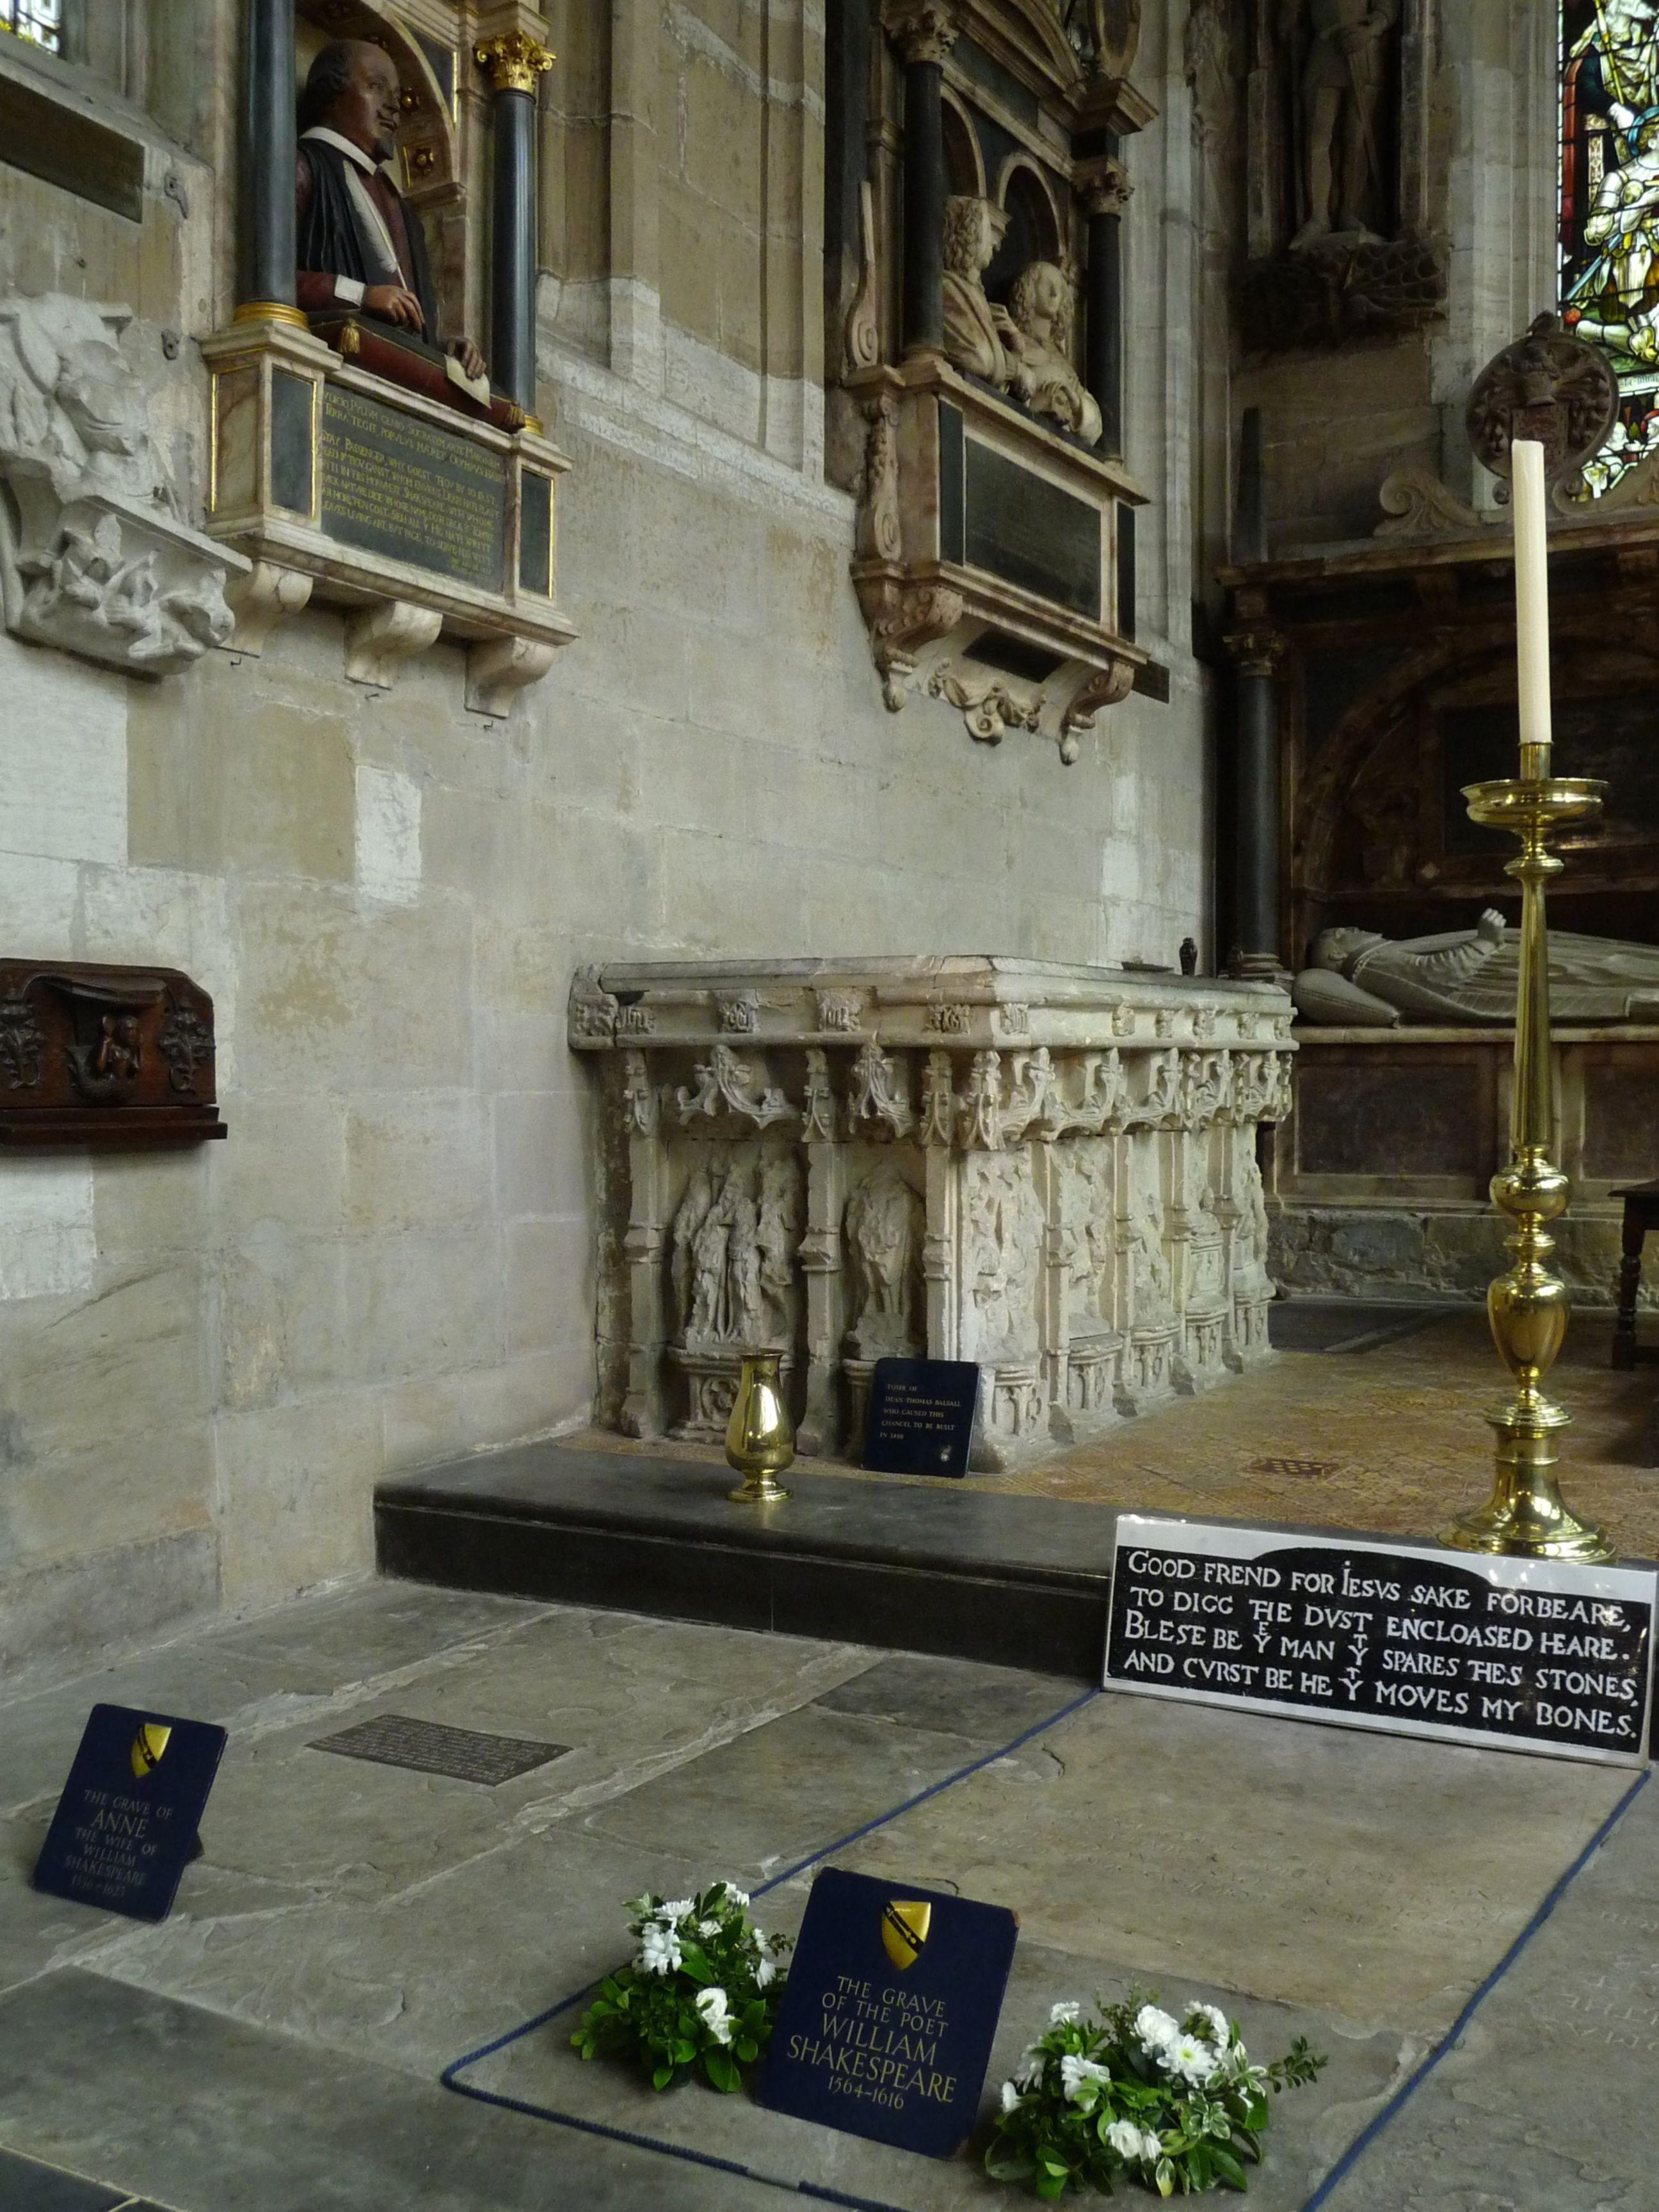 epitaffi famosi shakespeare